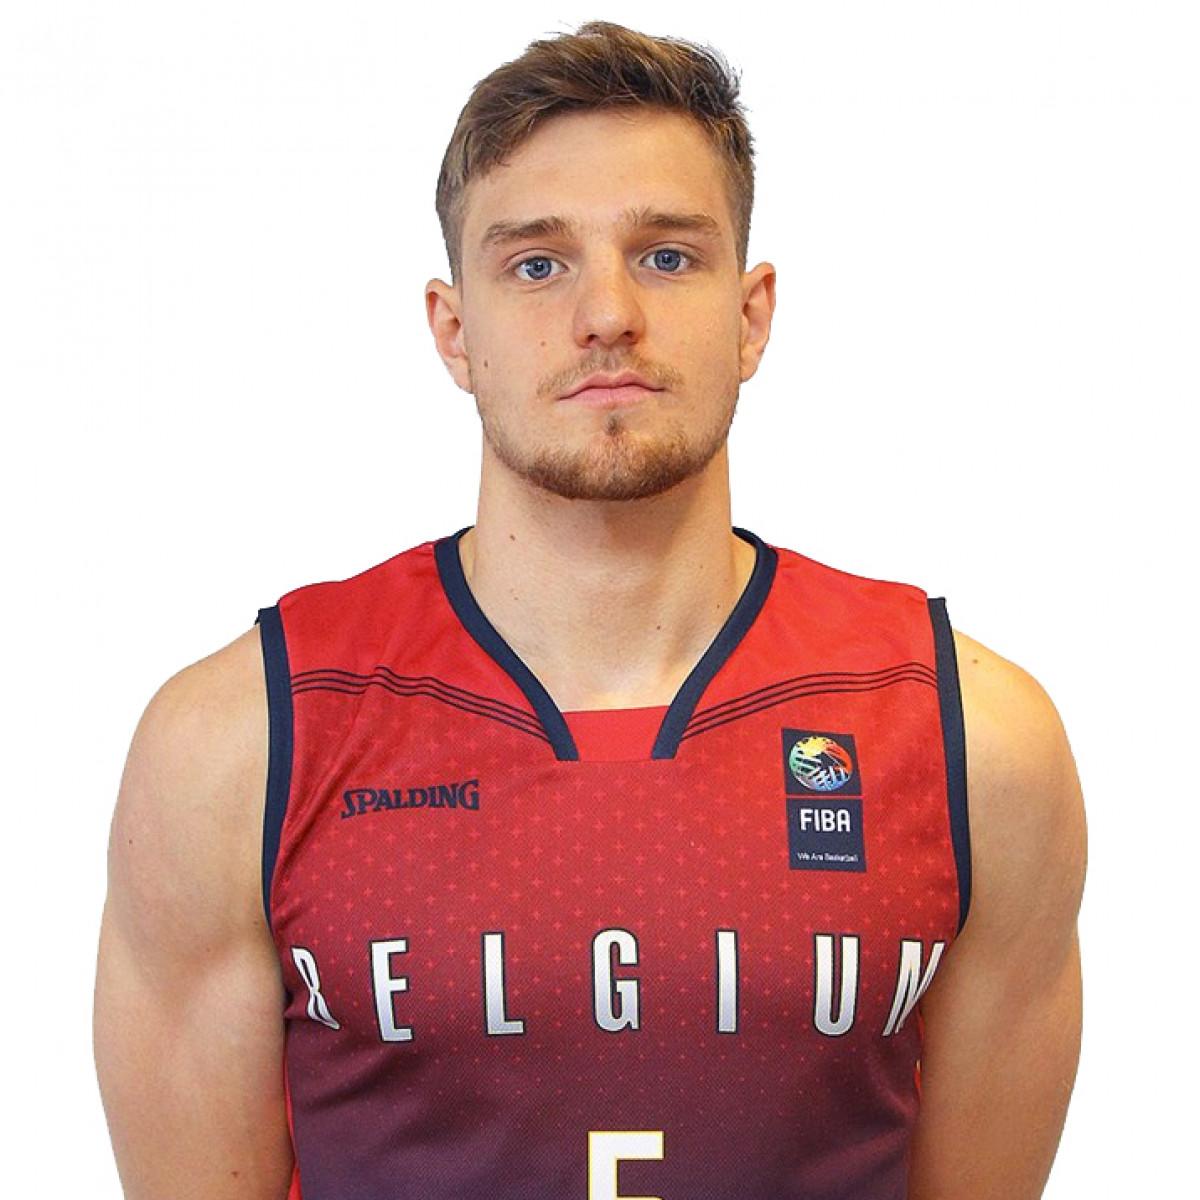 Photo of Seppe D'espalier, 2019-2020 season